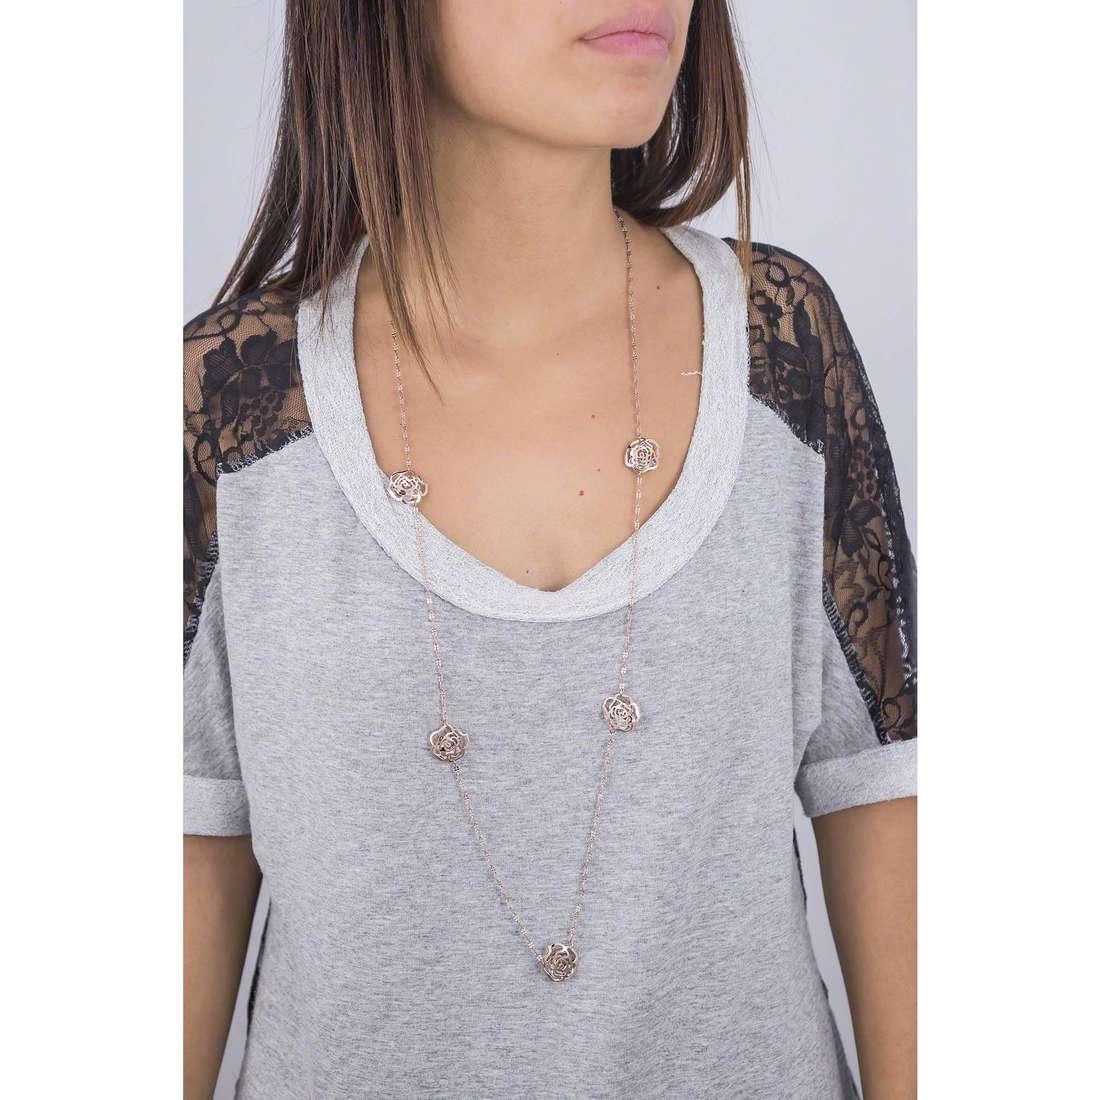 Marlù collane Chic donna 4CO0099R indosso